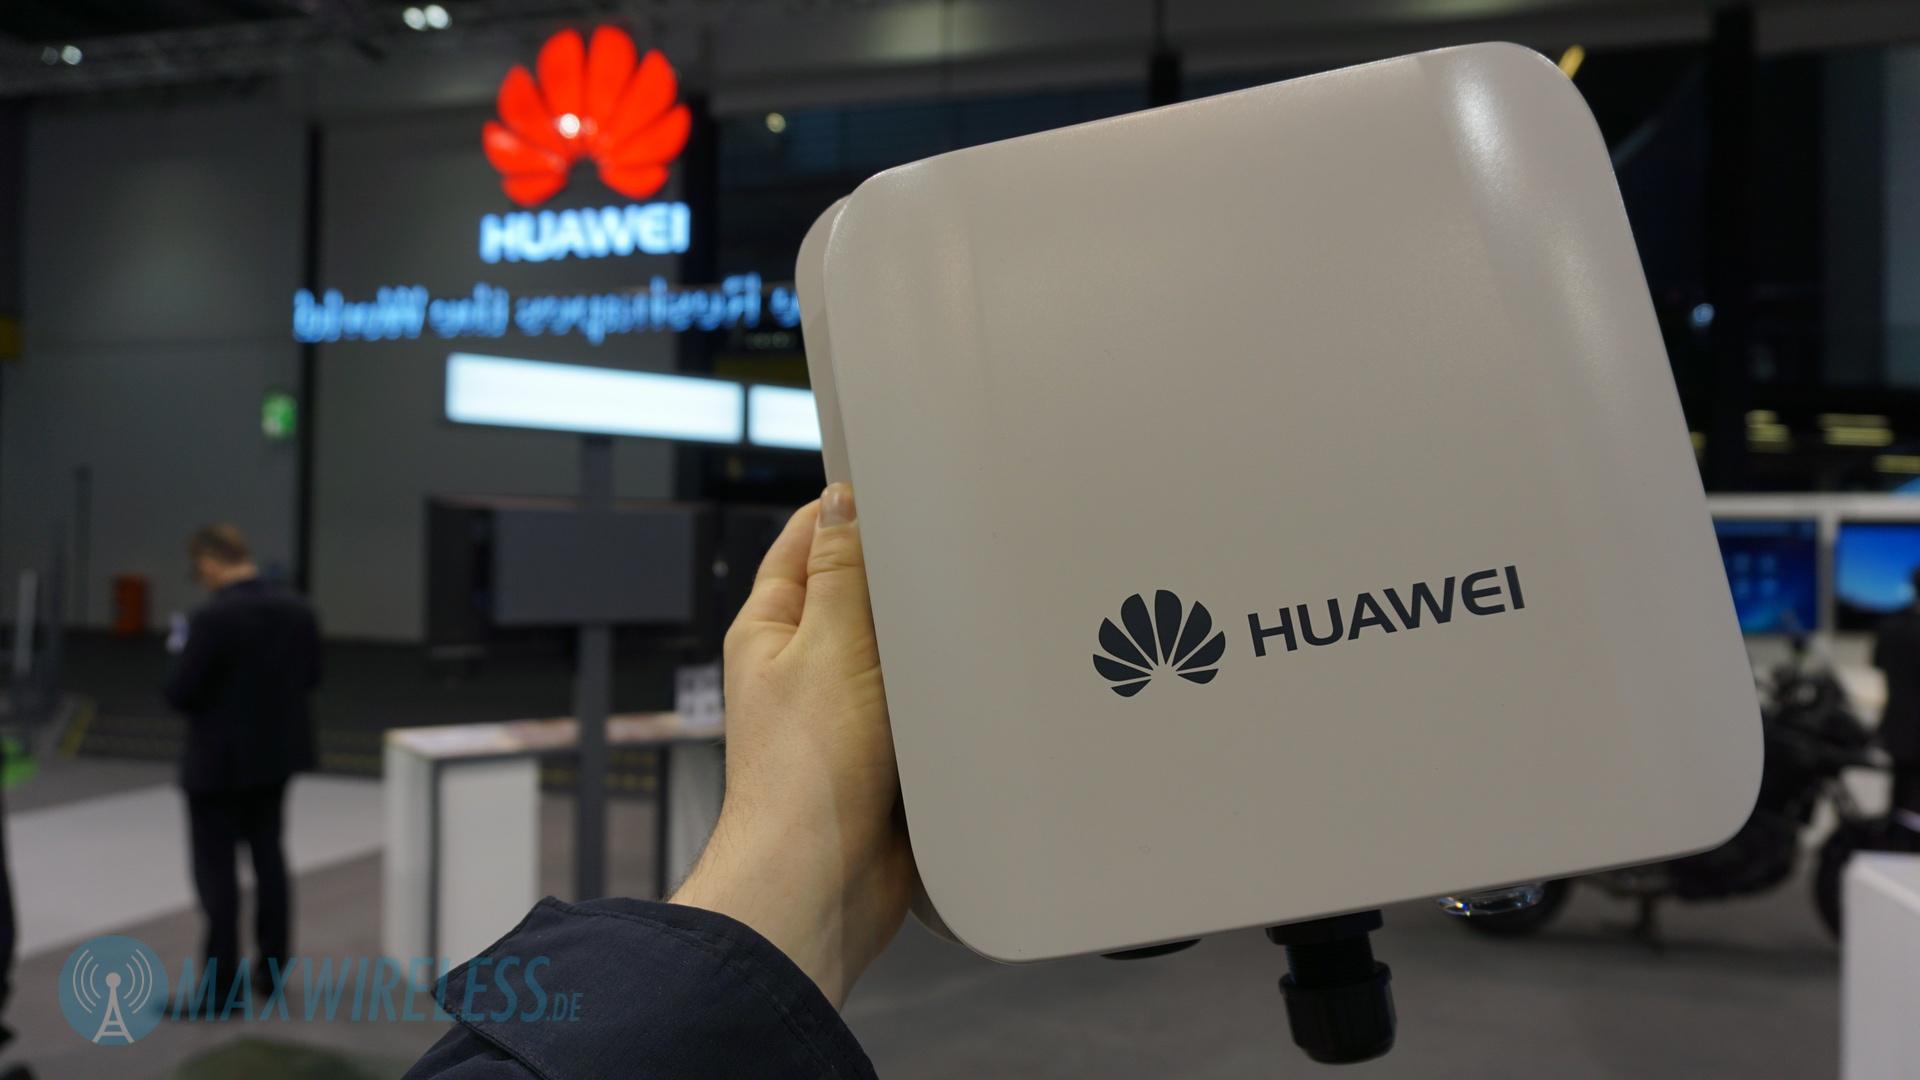 huawei b2338 outdoor lte modem mit poe verbindung. Black Bedroom Furniture Sets. Home Design Ideas